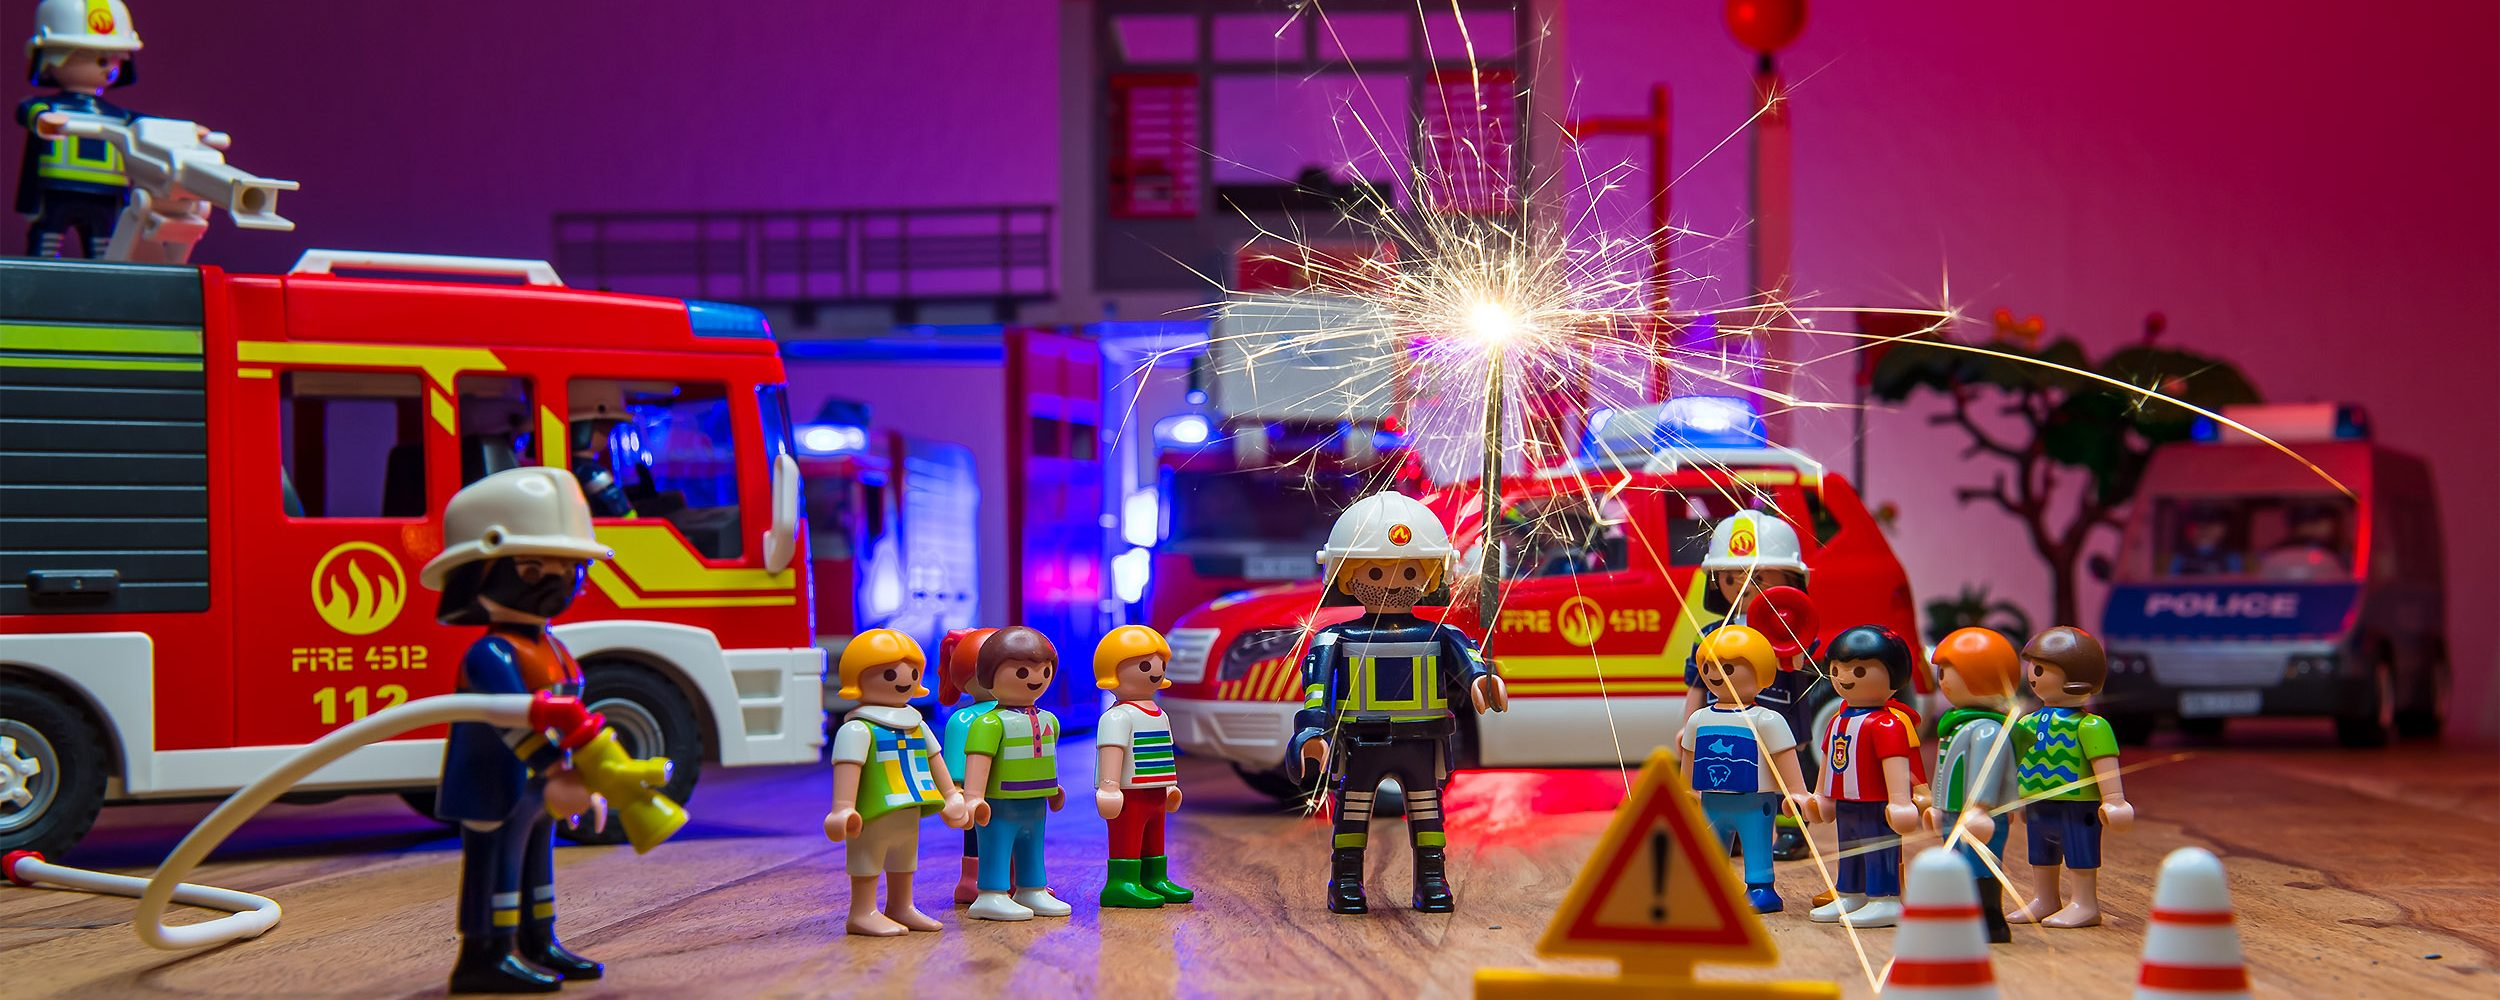 Feuerwehr Warendorf - Brandschutzerziehung